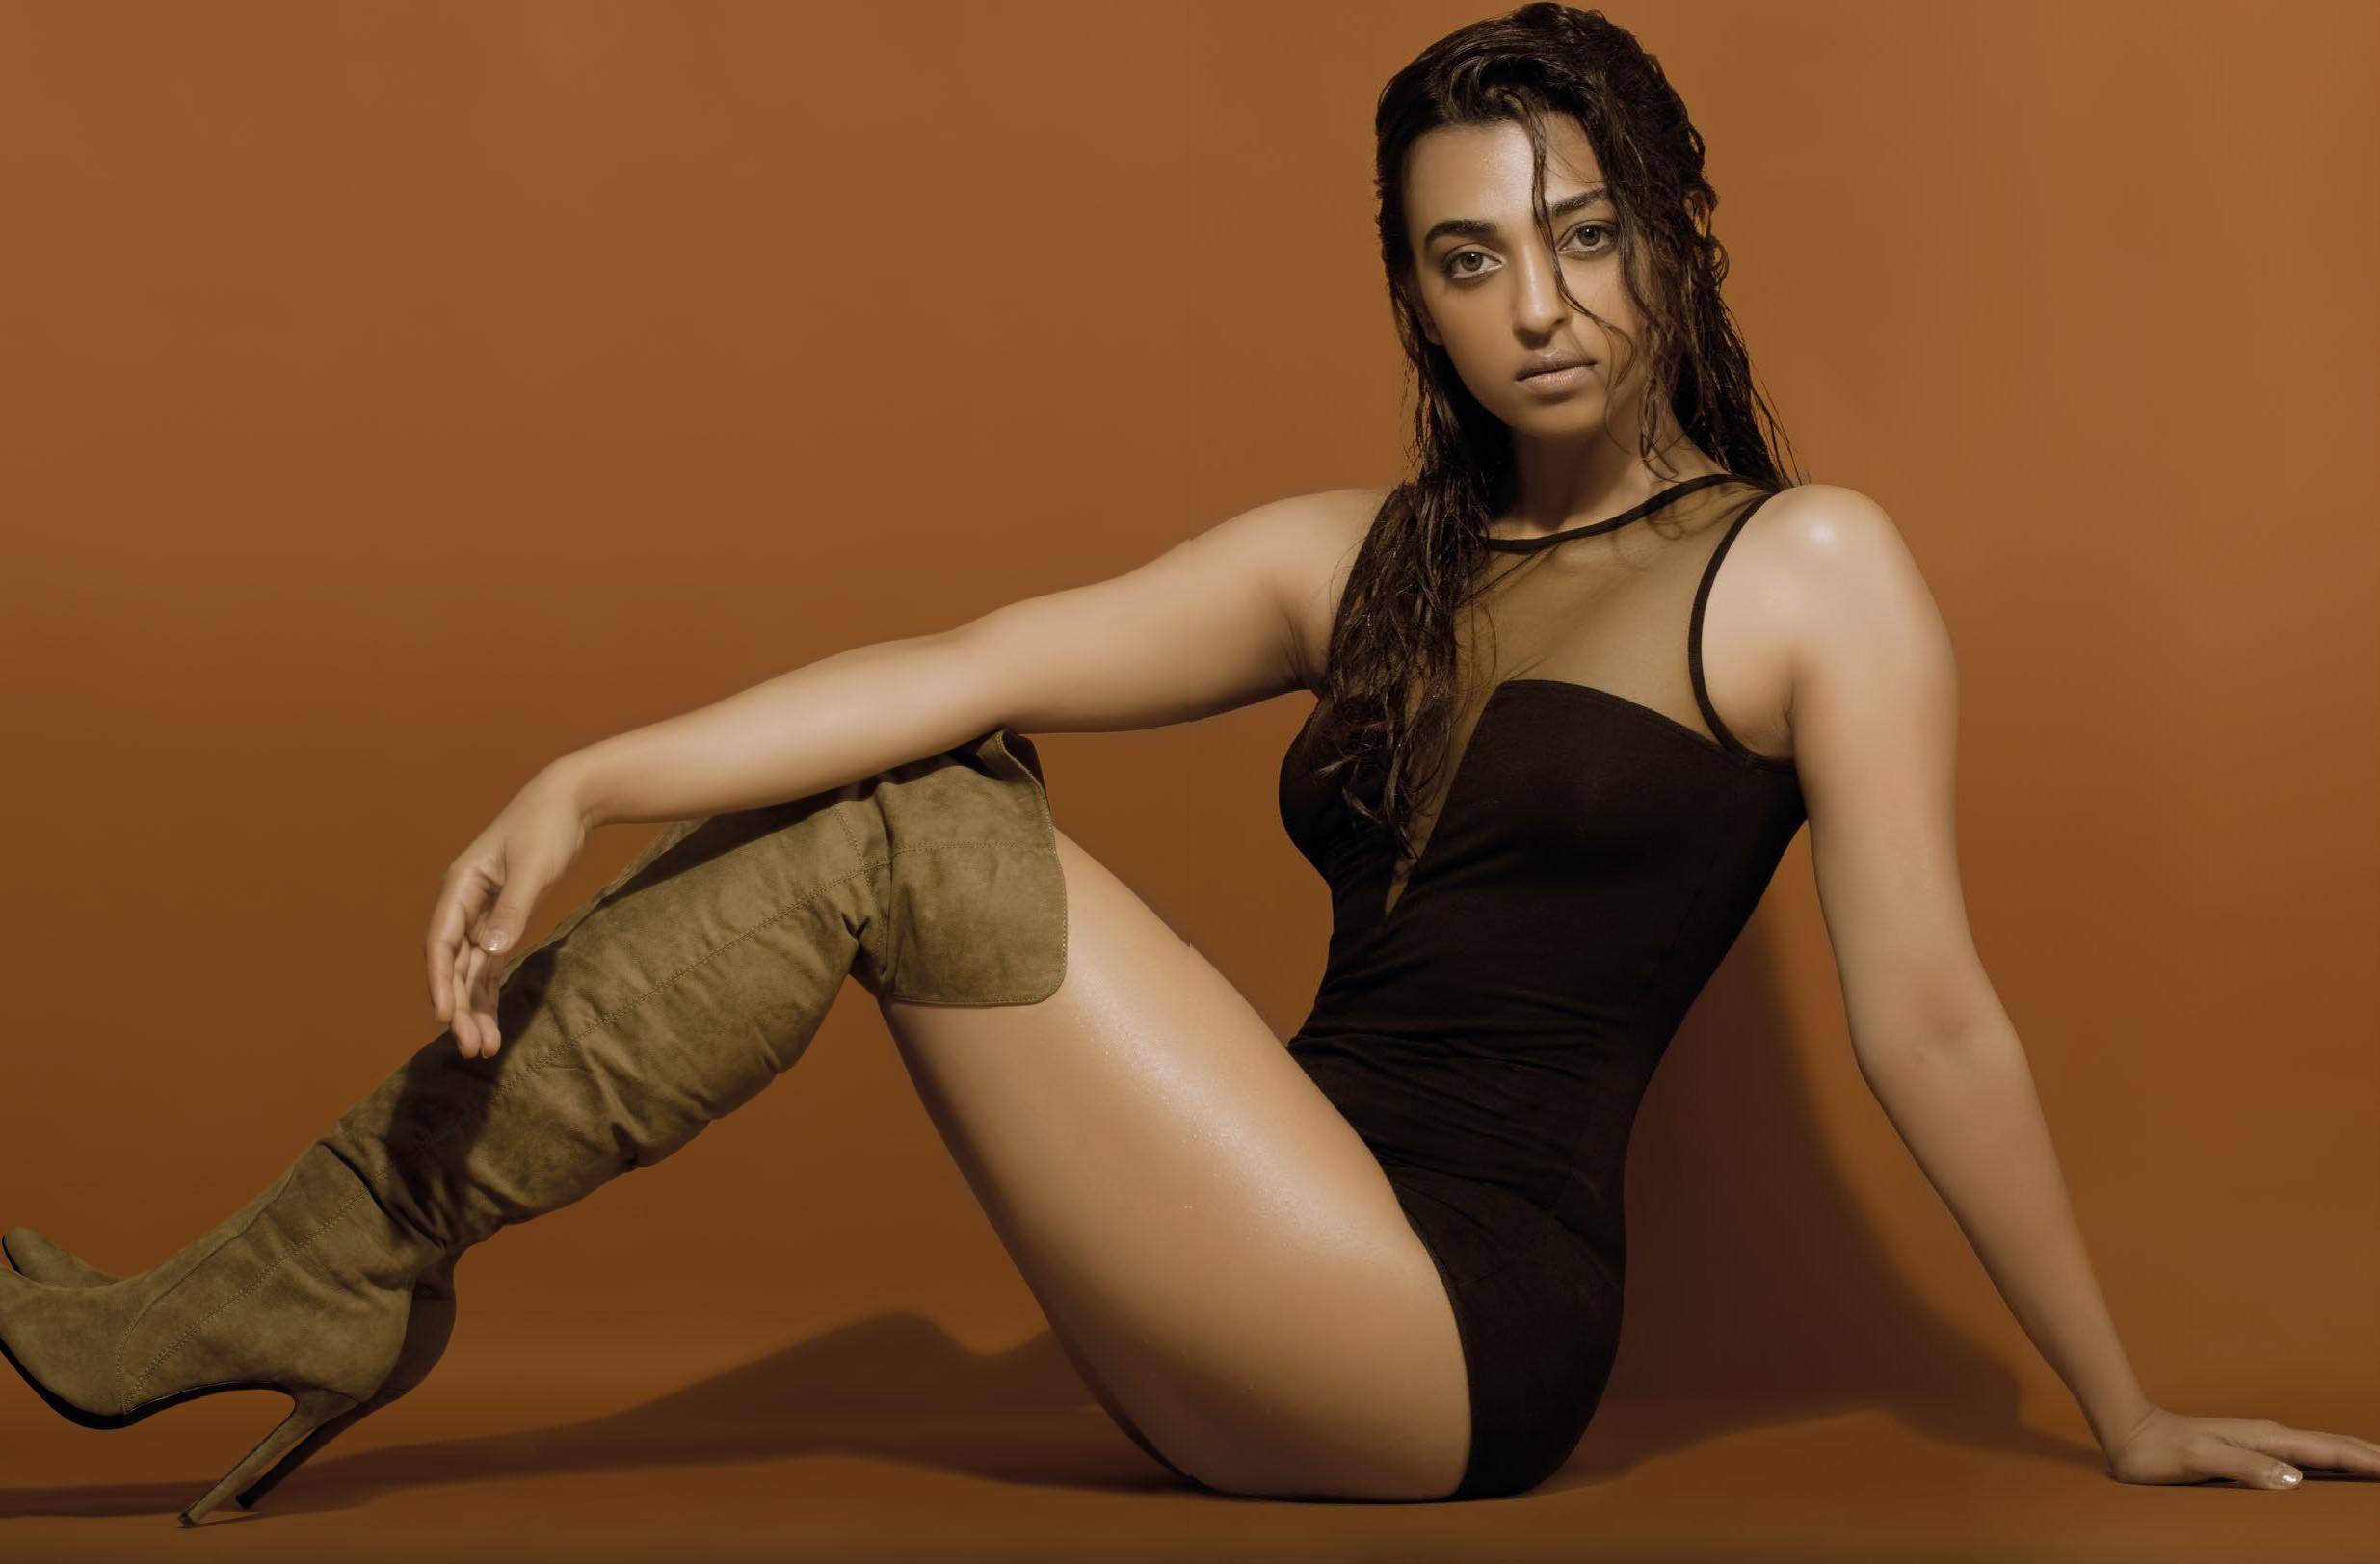 Radhika Apte Hot Sexy Images from Latest Photoshoot